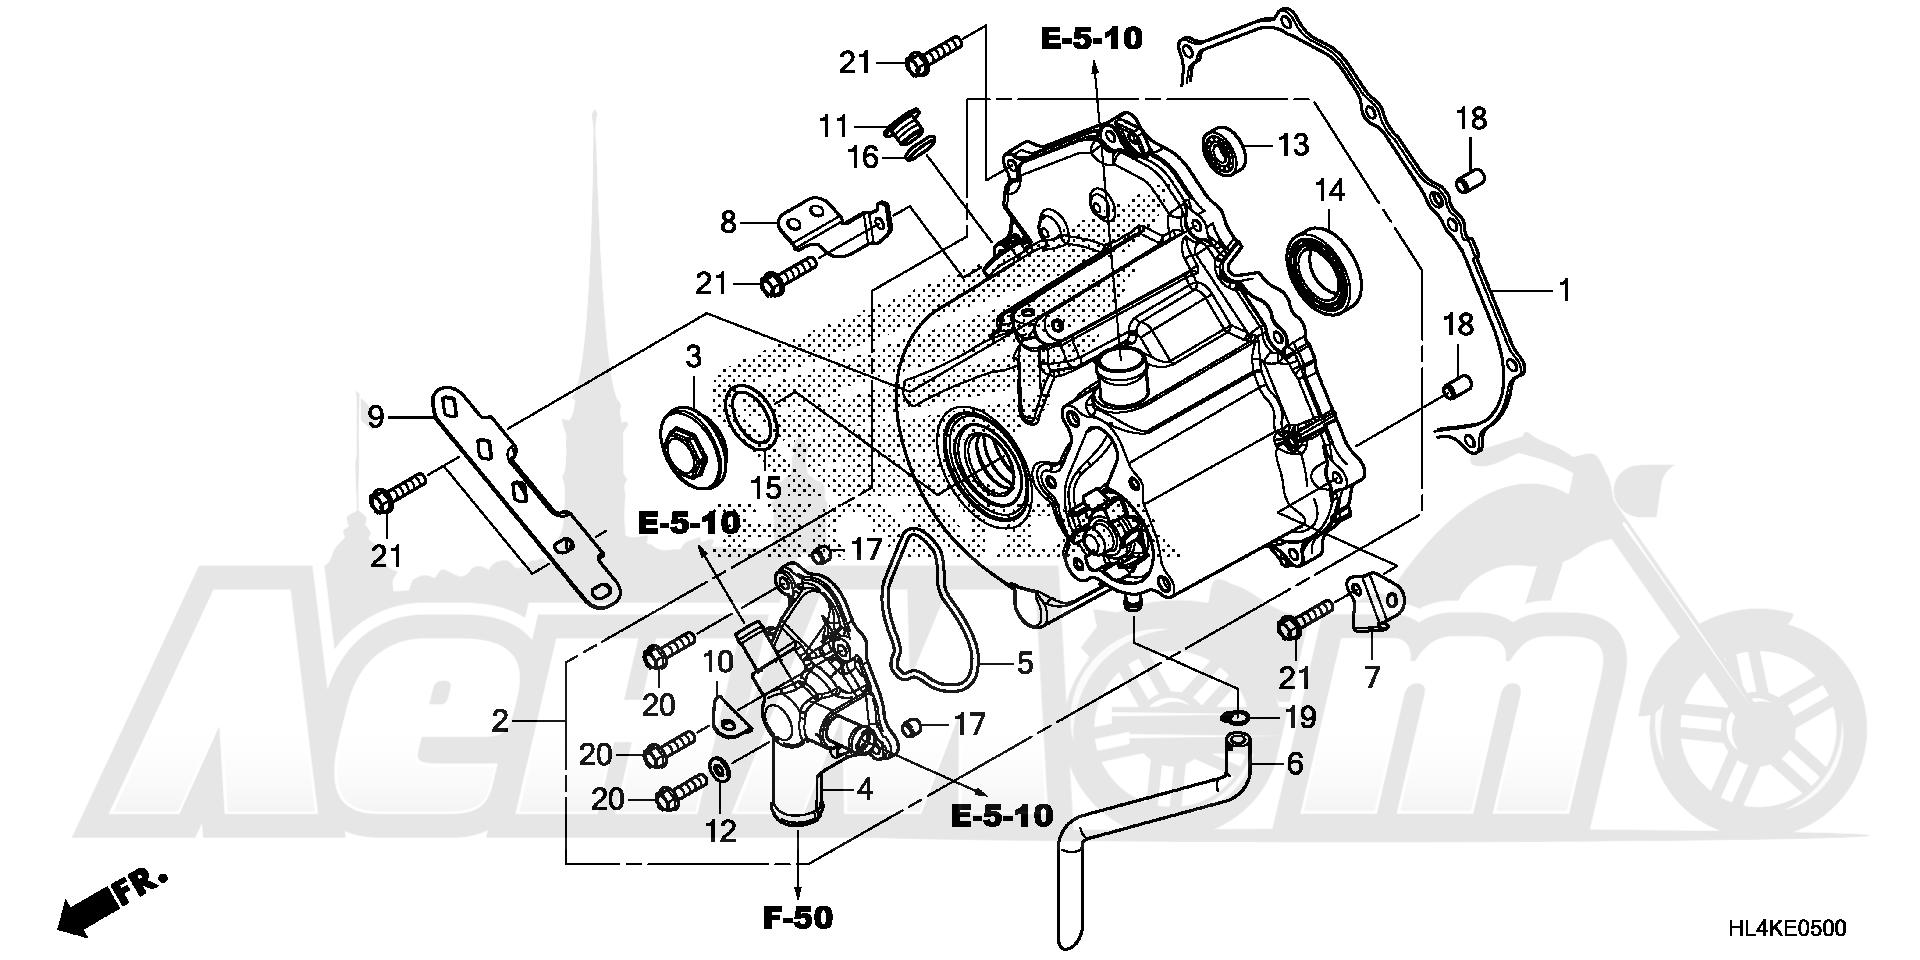 Запчасти для Квадроцикла Honda 2019 SXS1000M3P Раздел: ALTERNATOR COVER | генератор крышка